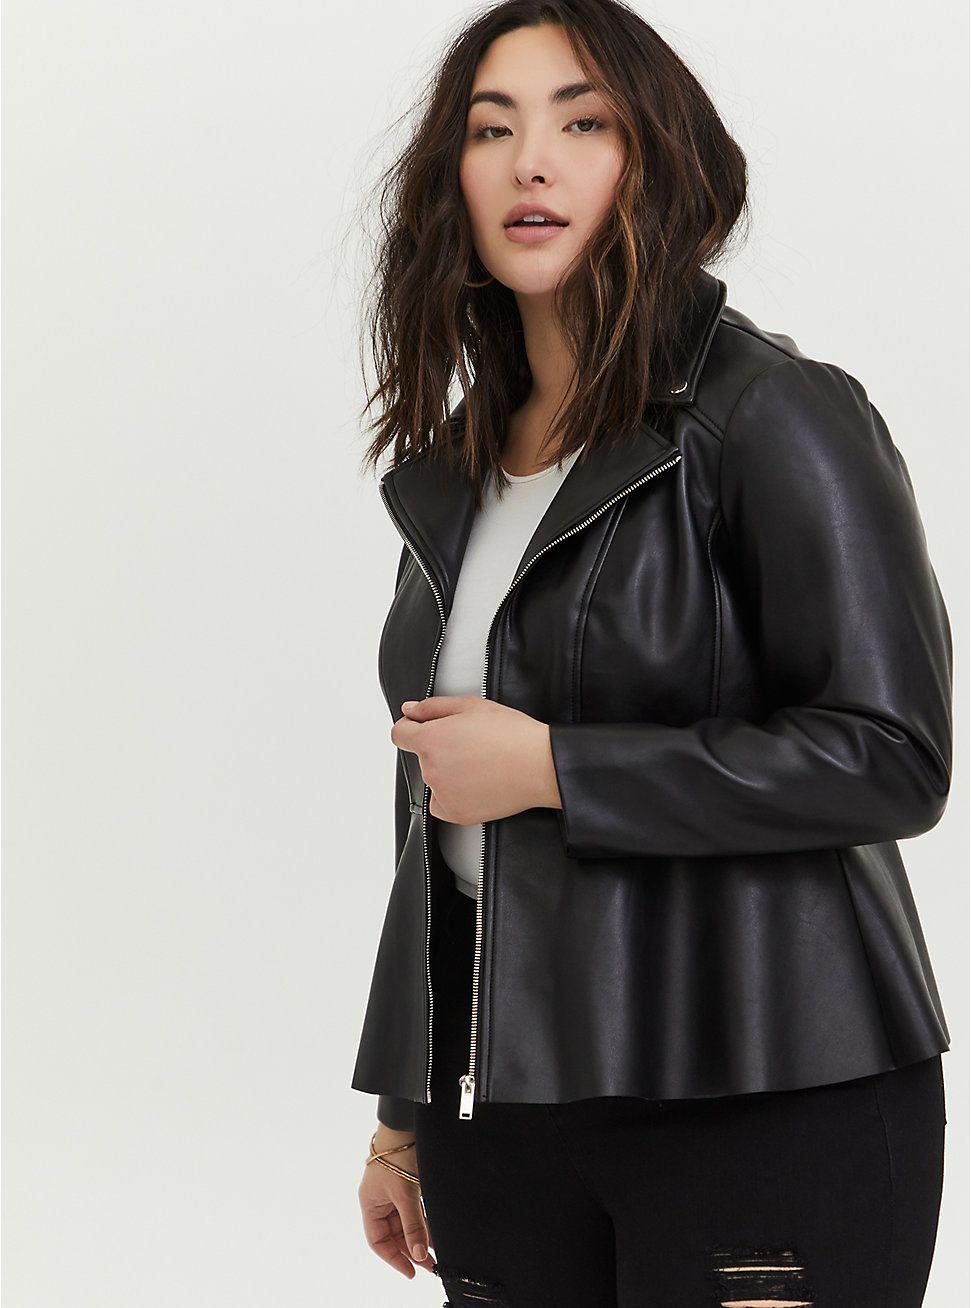 Black Faux Leather Peplum Moto Jacket Leather Peplum Black Faux Leather Faux Leather Moto Jacket [ 1308 x 971 Pixel ]